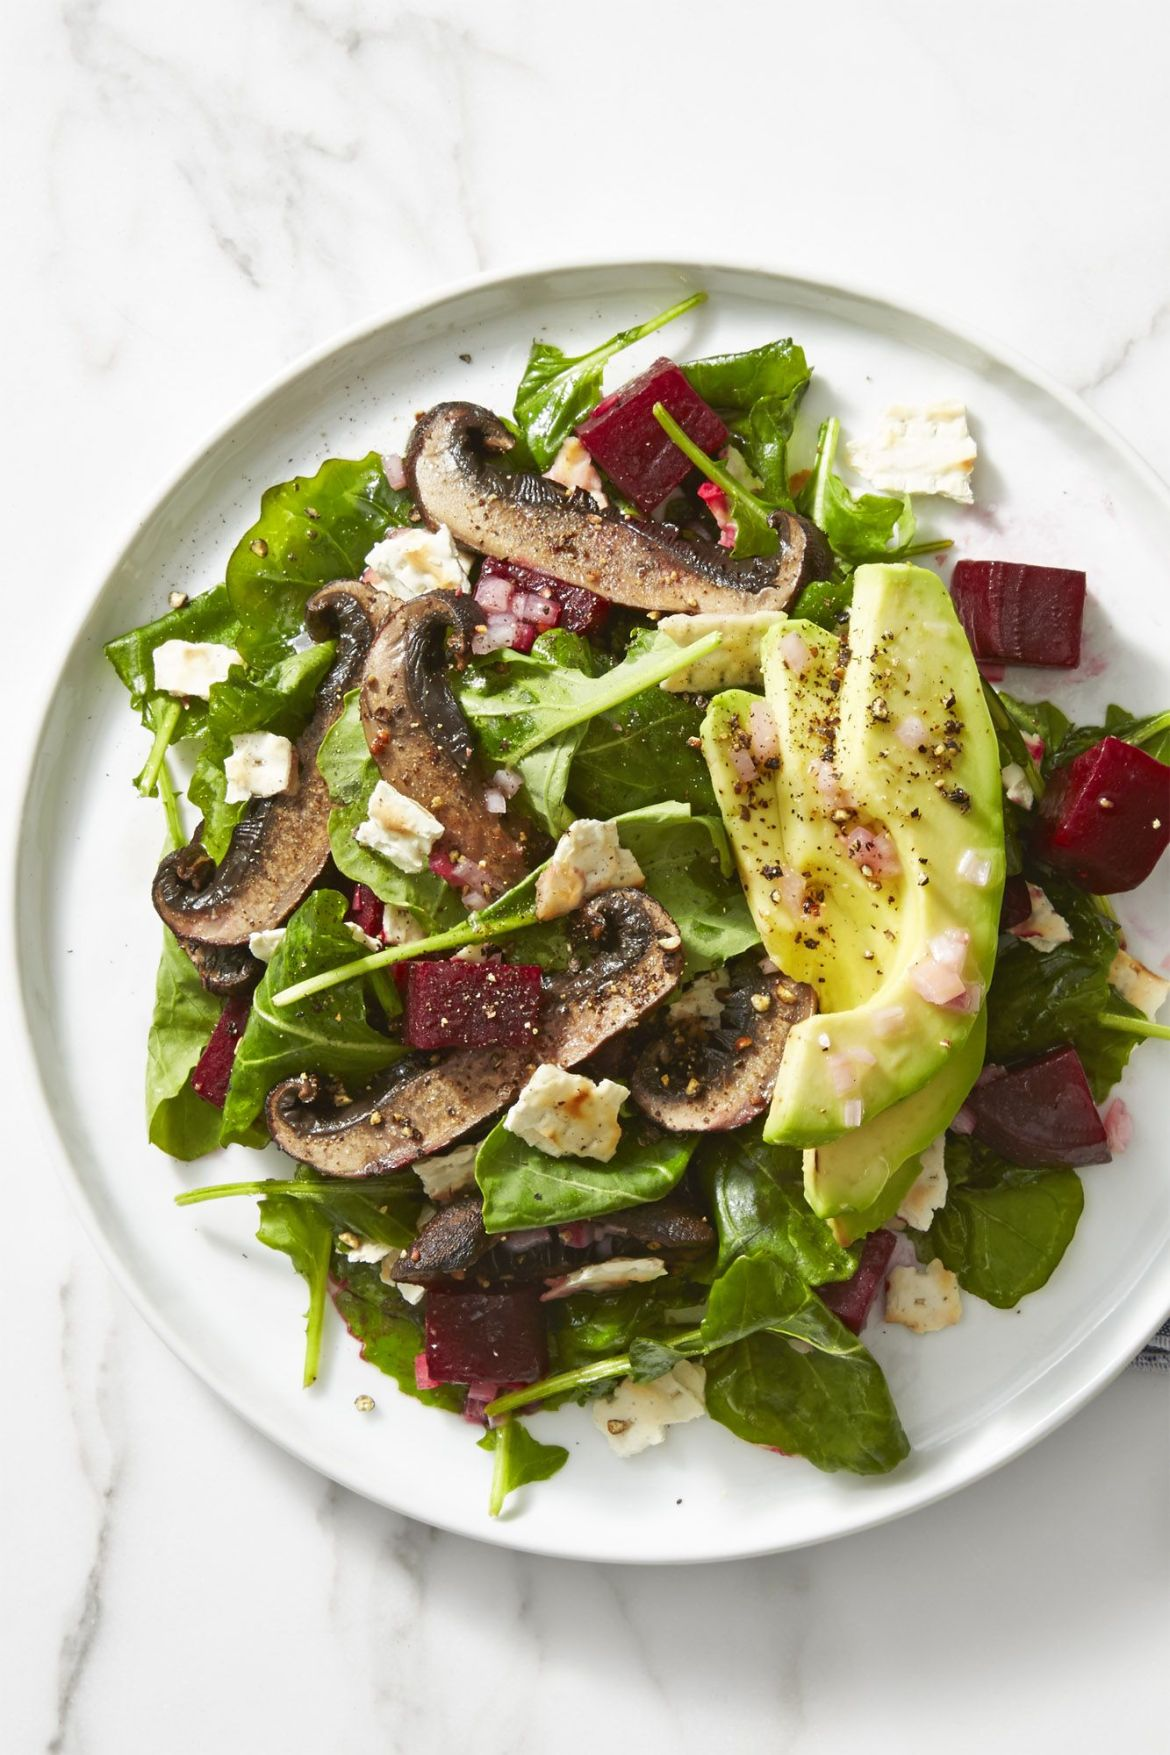 beet avocado mushroom salad healthy lunch ideas 1555341989 - Healthy Things to Eat for Lunch -19 Healthy Lunch Ideas for You